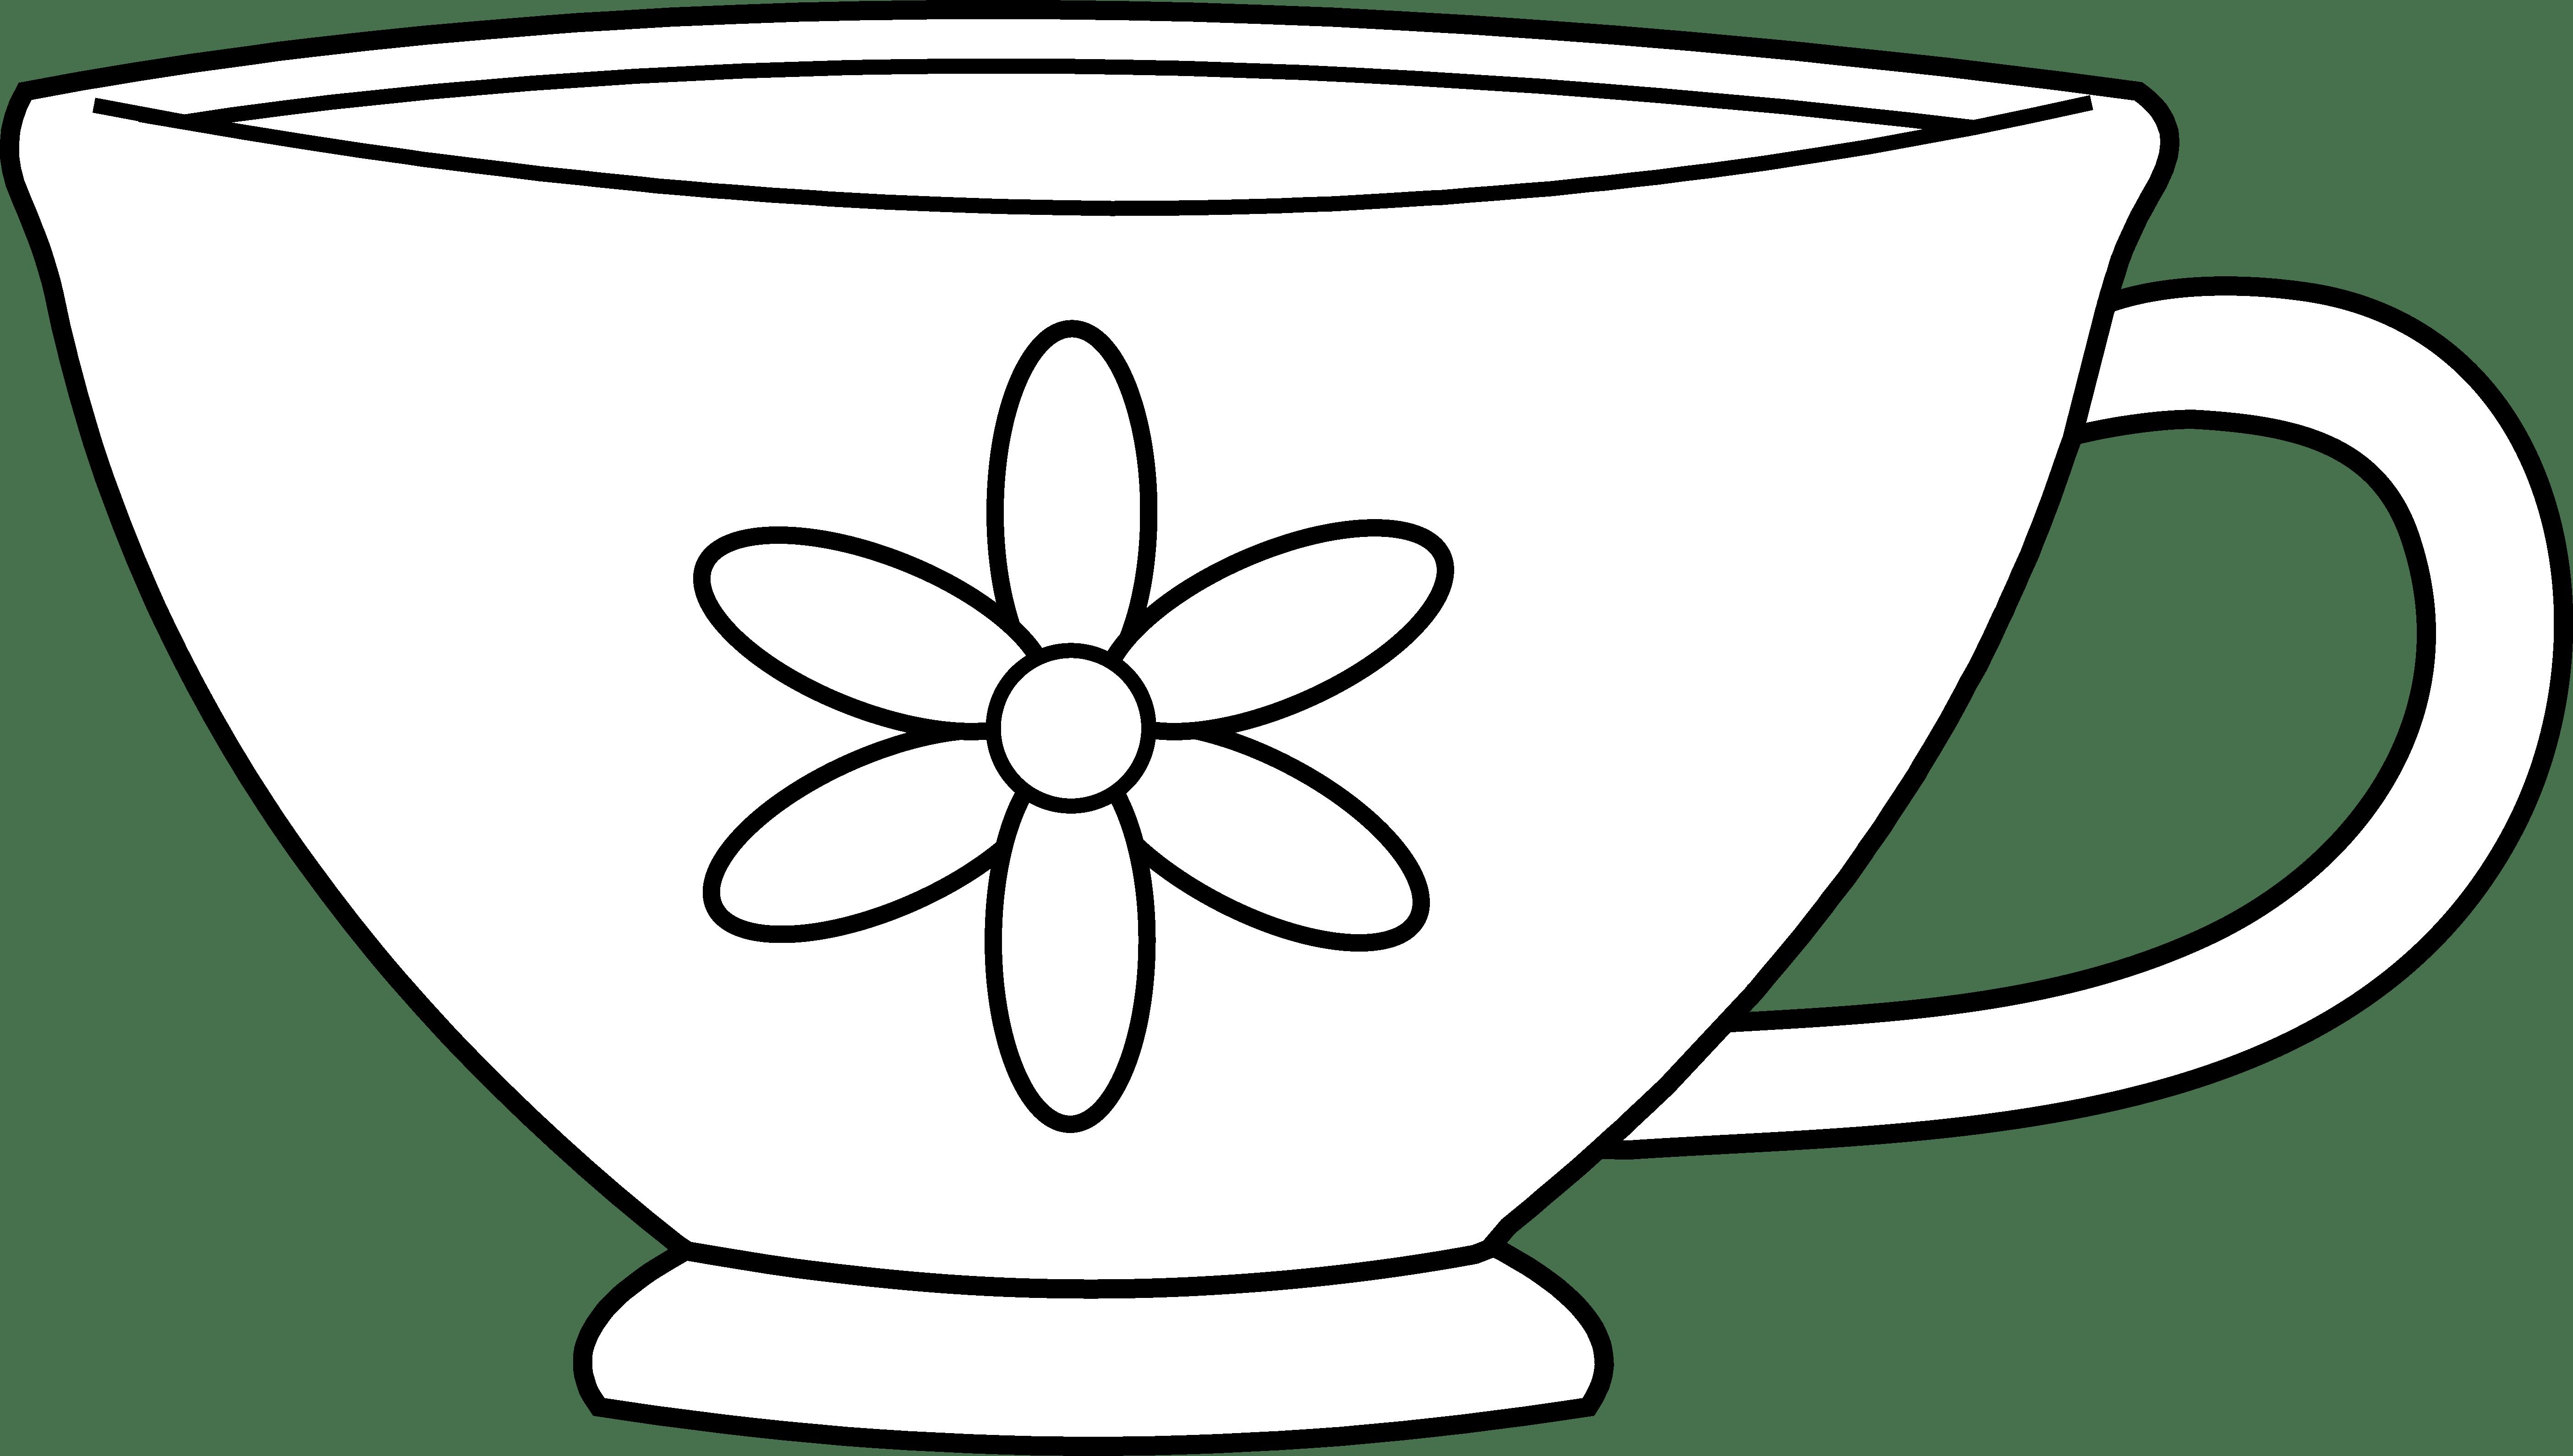 jpg freeuse stock Mug clipart colouring page. Cup coloring democraciaejustica simple.